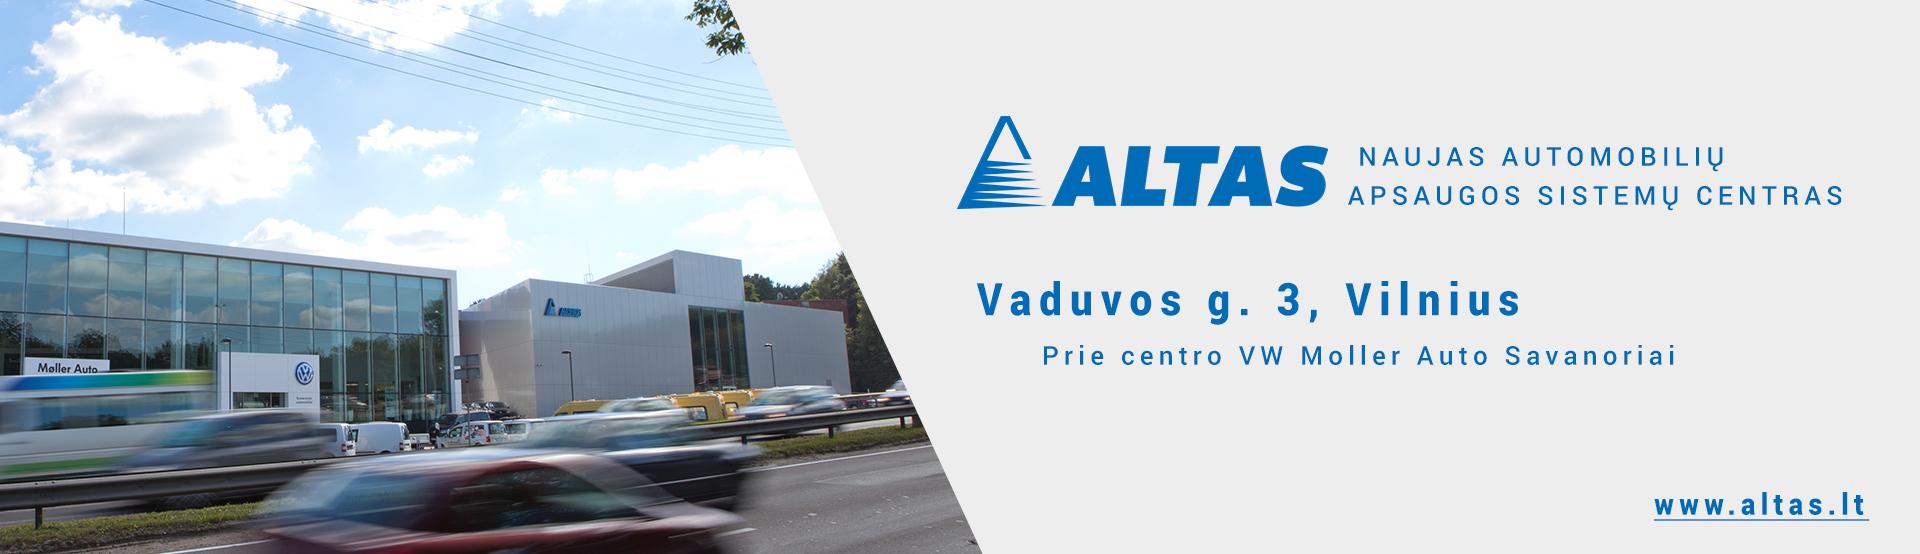 Vilniaus Altas